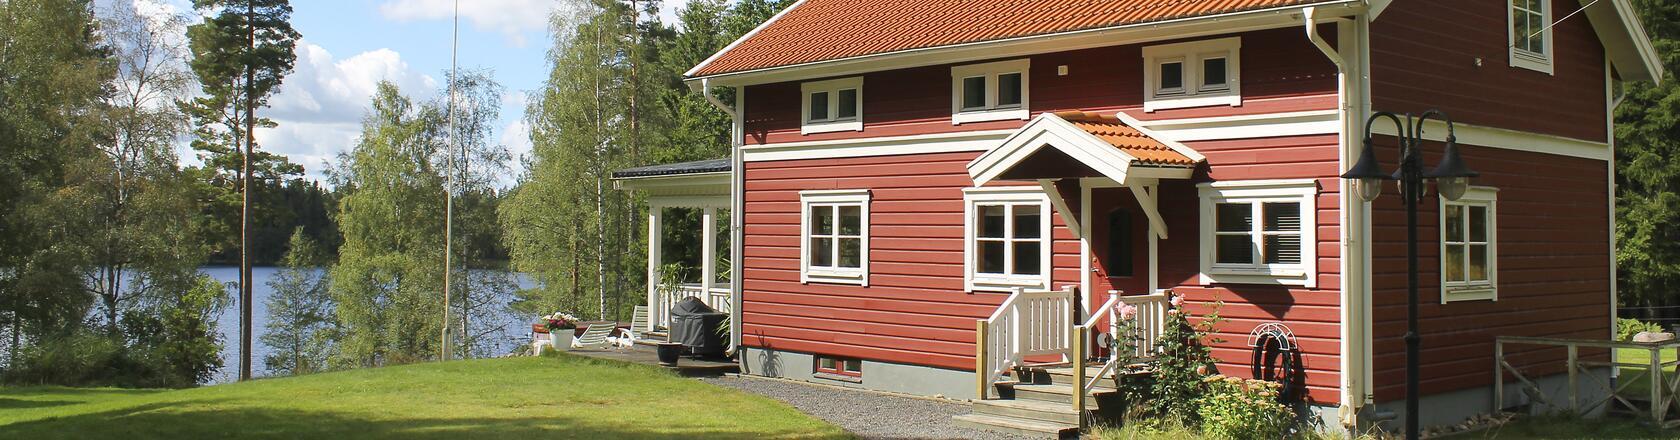 gislaved in schweden ferienh user bei dancenter mieten. Black Bedroom Furniture Sets. Home Design Ideas